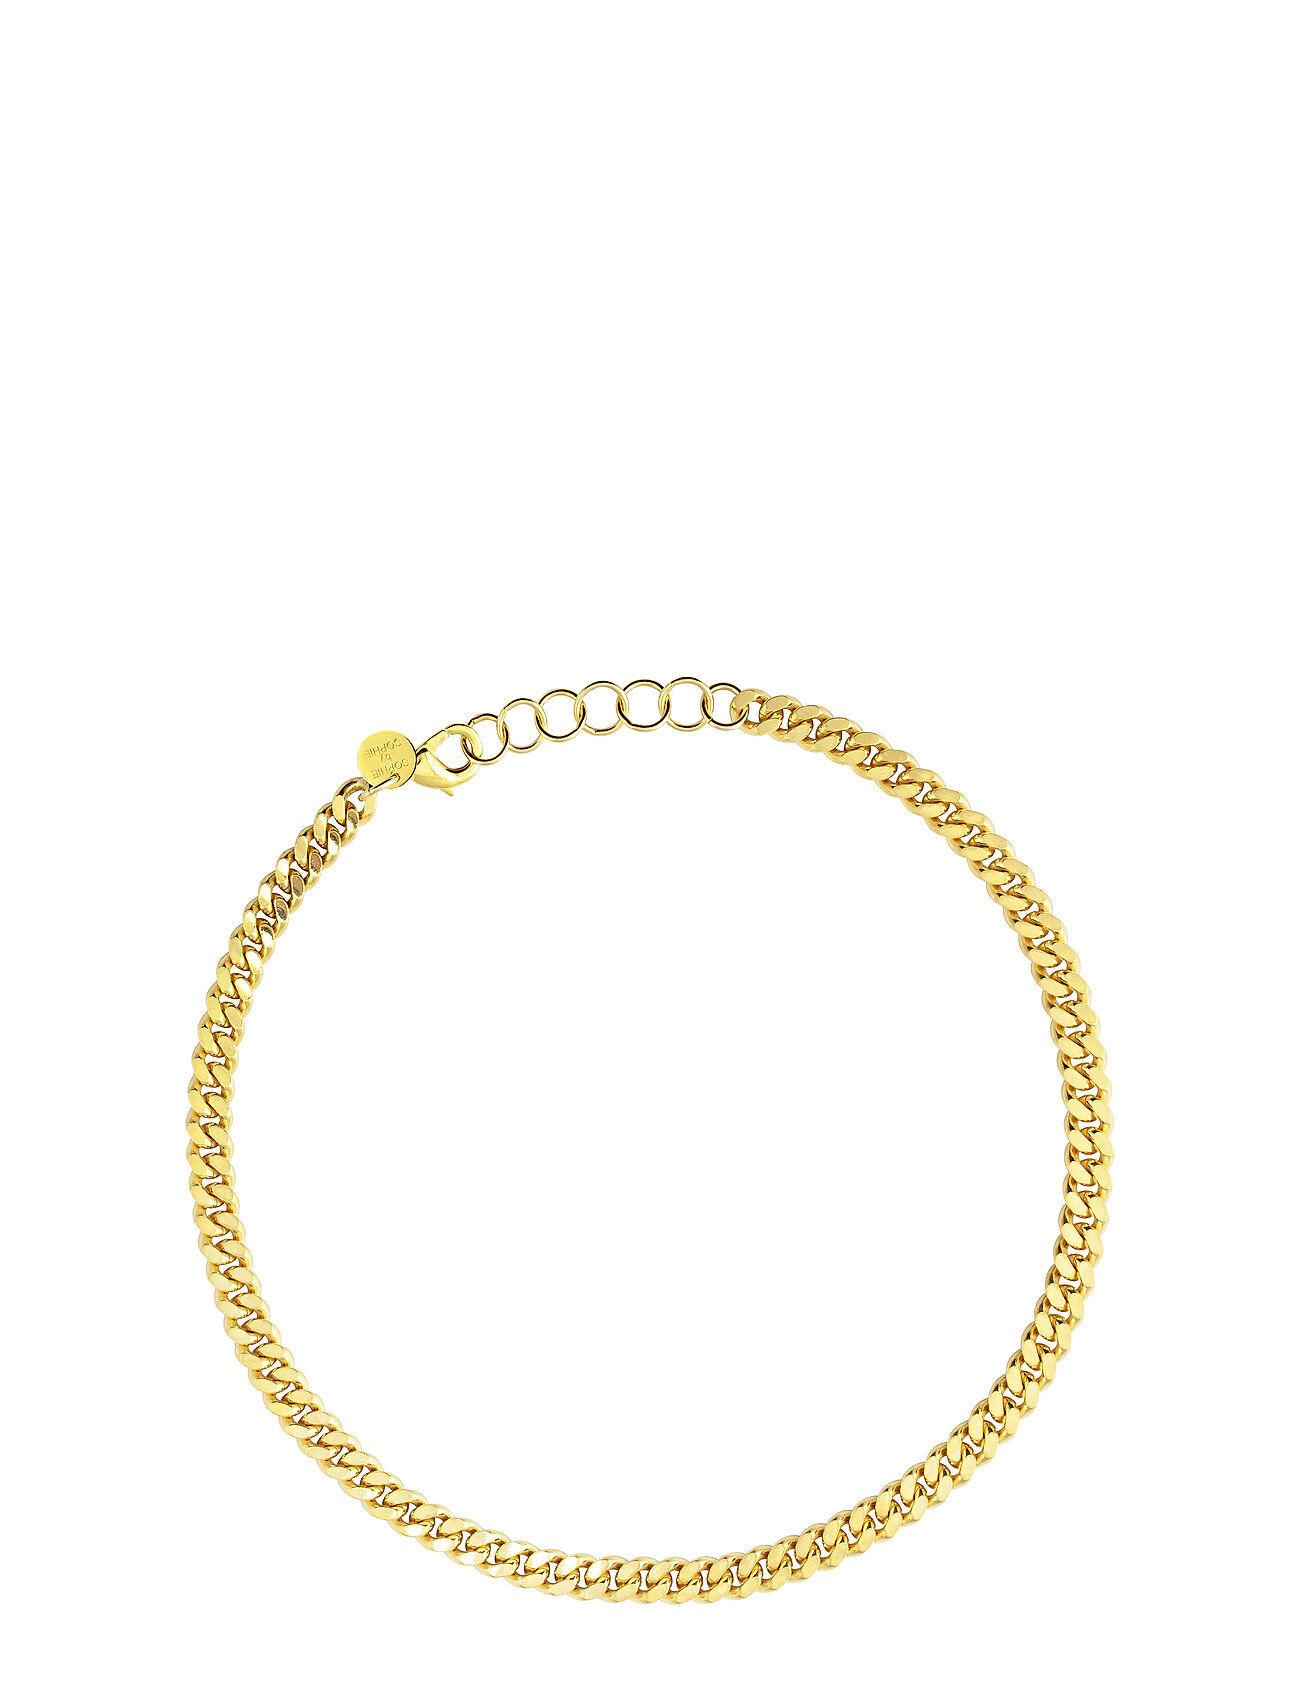 SOPHIE by SOPHIE Pansar Thin Necklace Accessories Jewellery Bracelets Chain Bracelets Kulta SOPHIE By SOPHIE